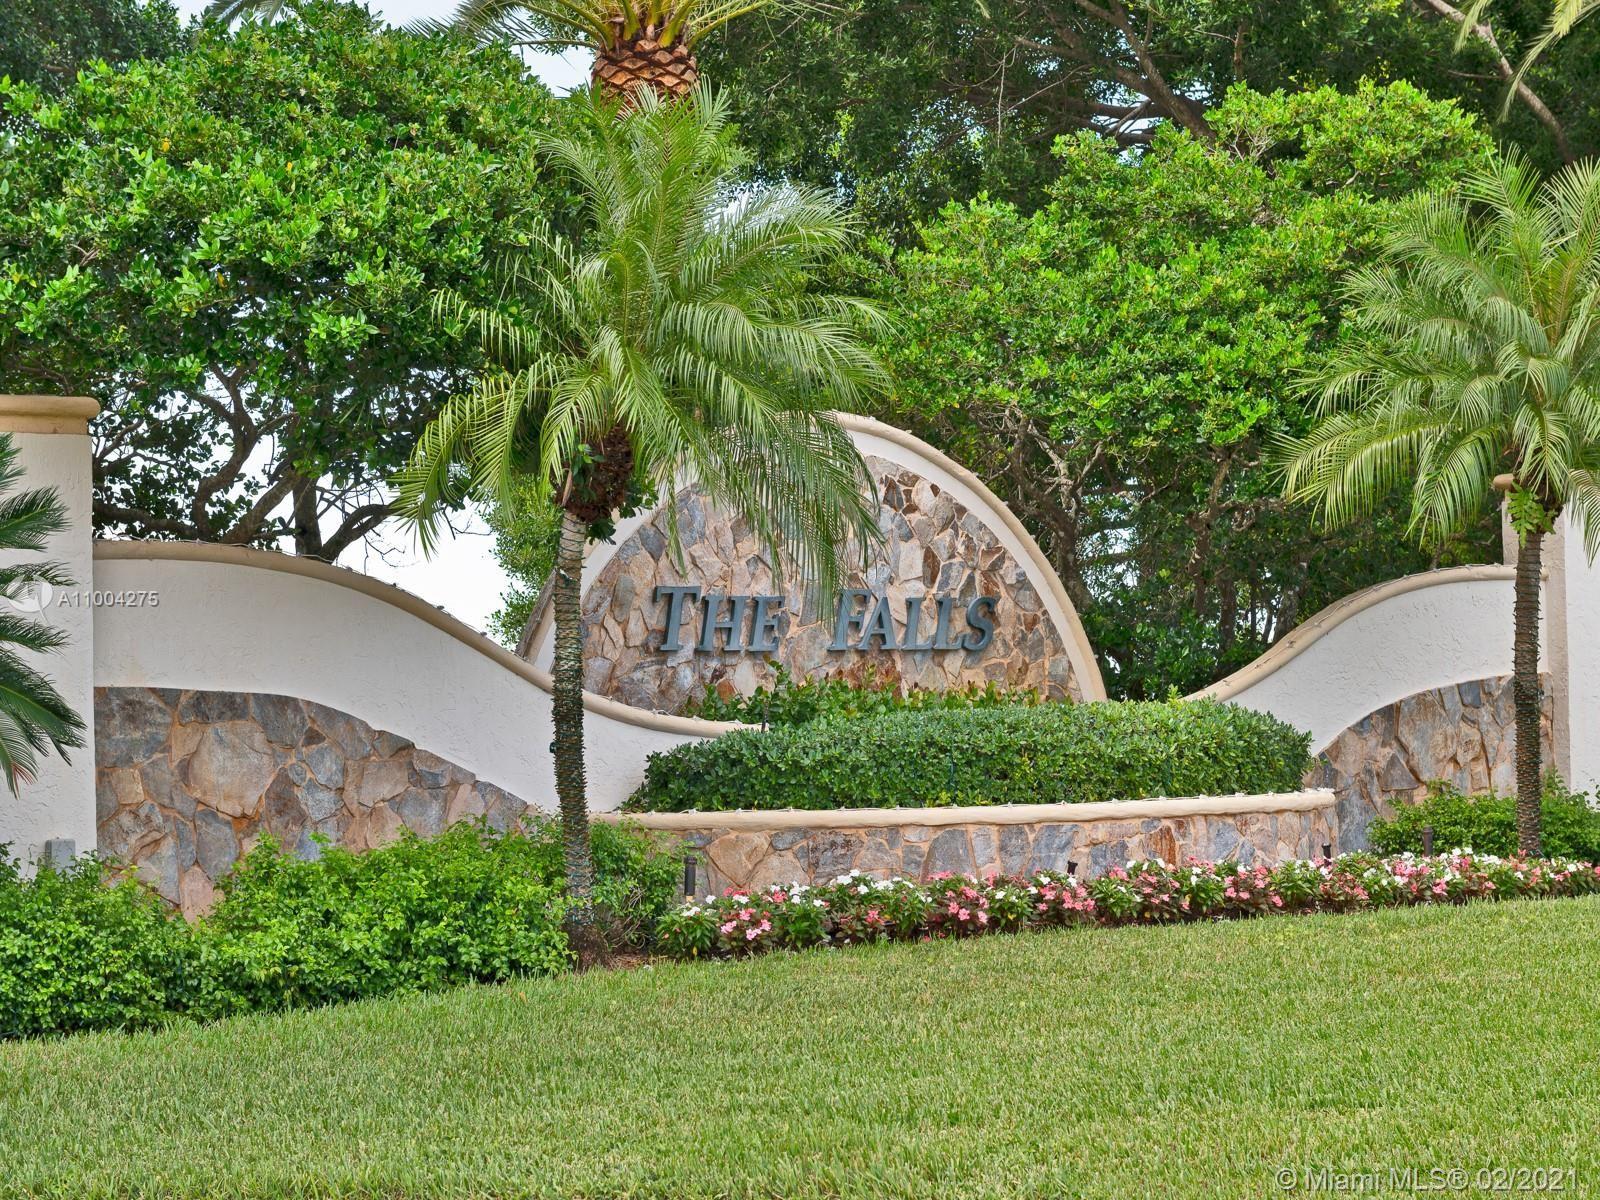 Photo of 840 Savannah Falls Dr, Weston, FL 33327 (MLS # A11004275)